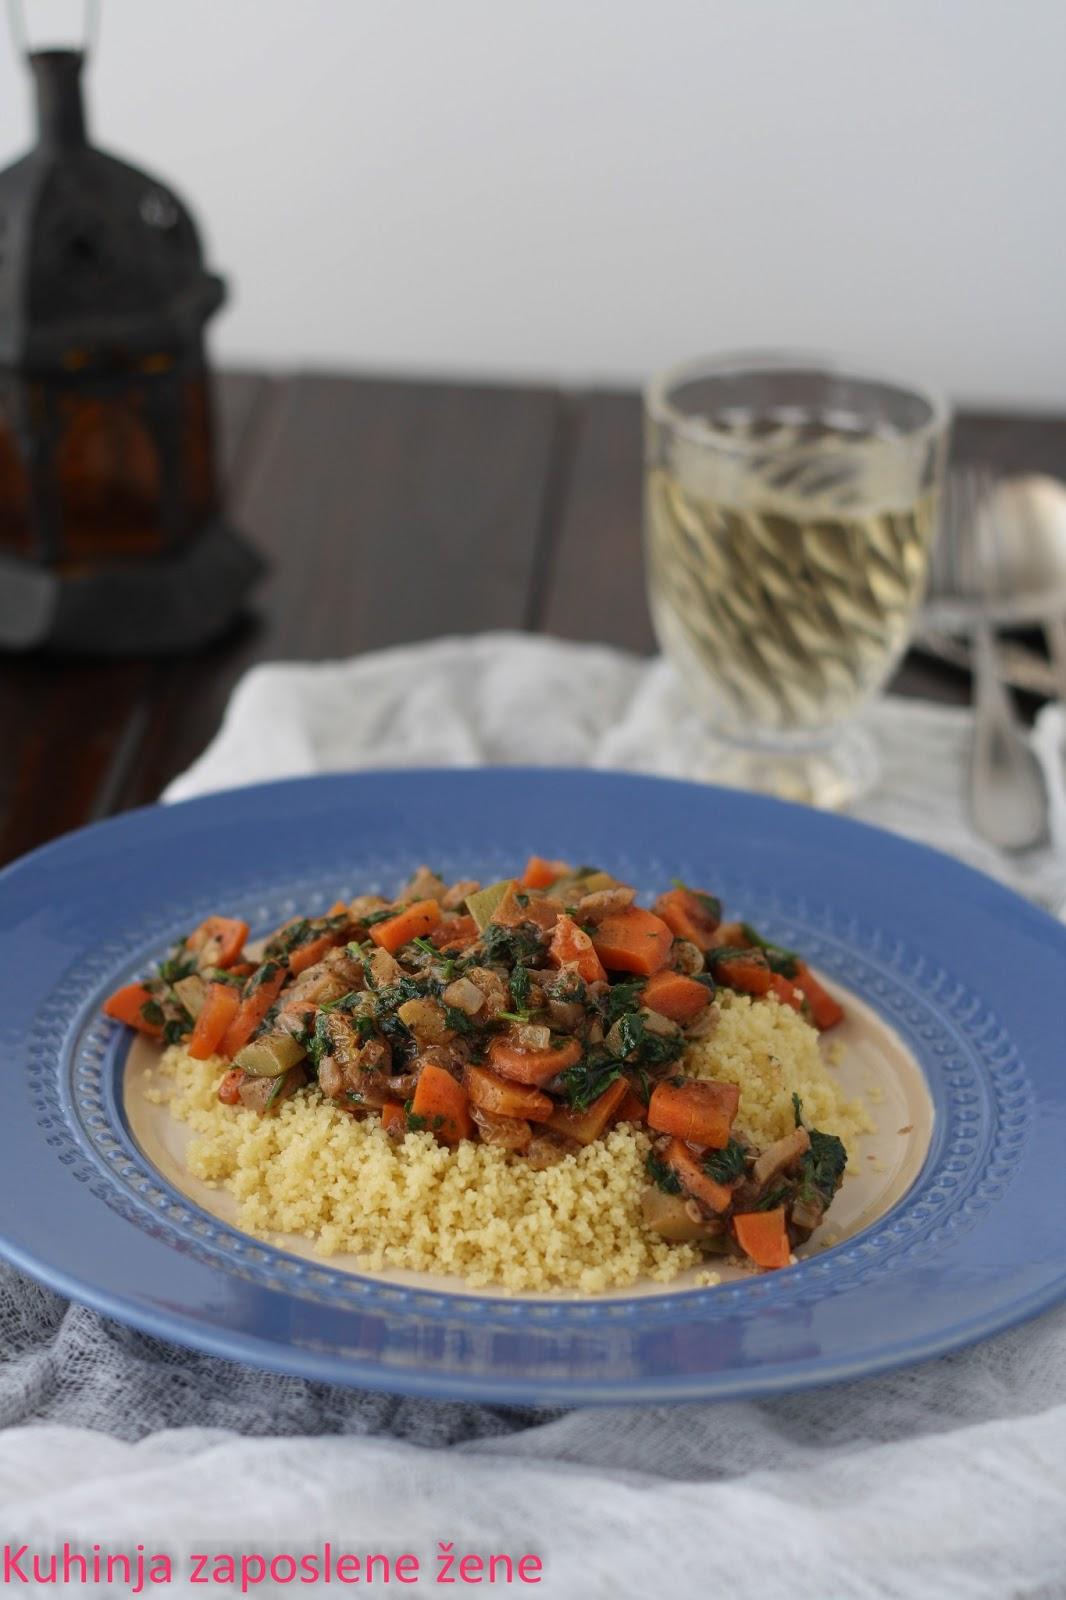 Kus-kus sa povrćem na orijentalni način / Couscous with vegetable in an oriental way